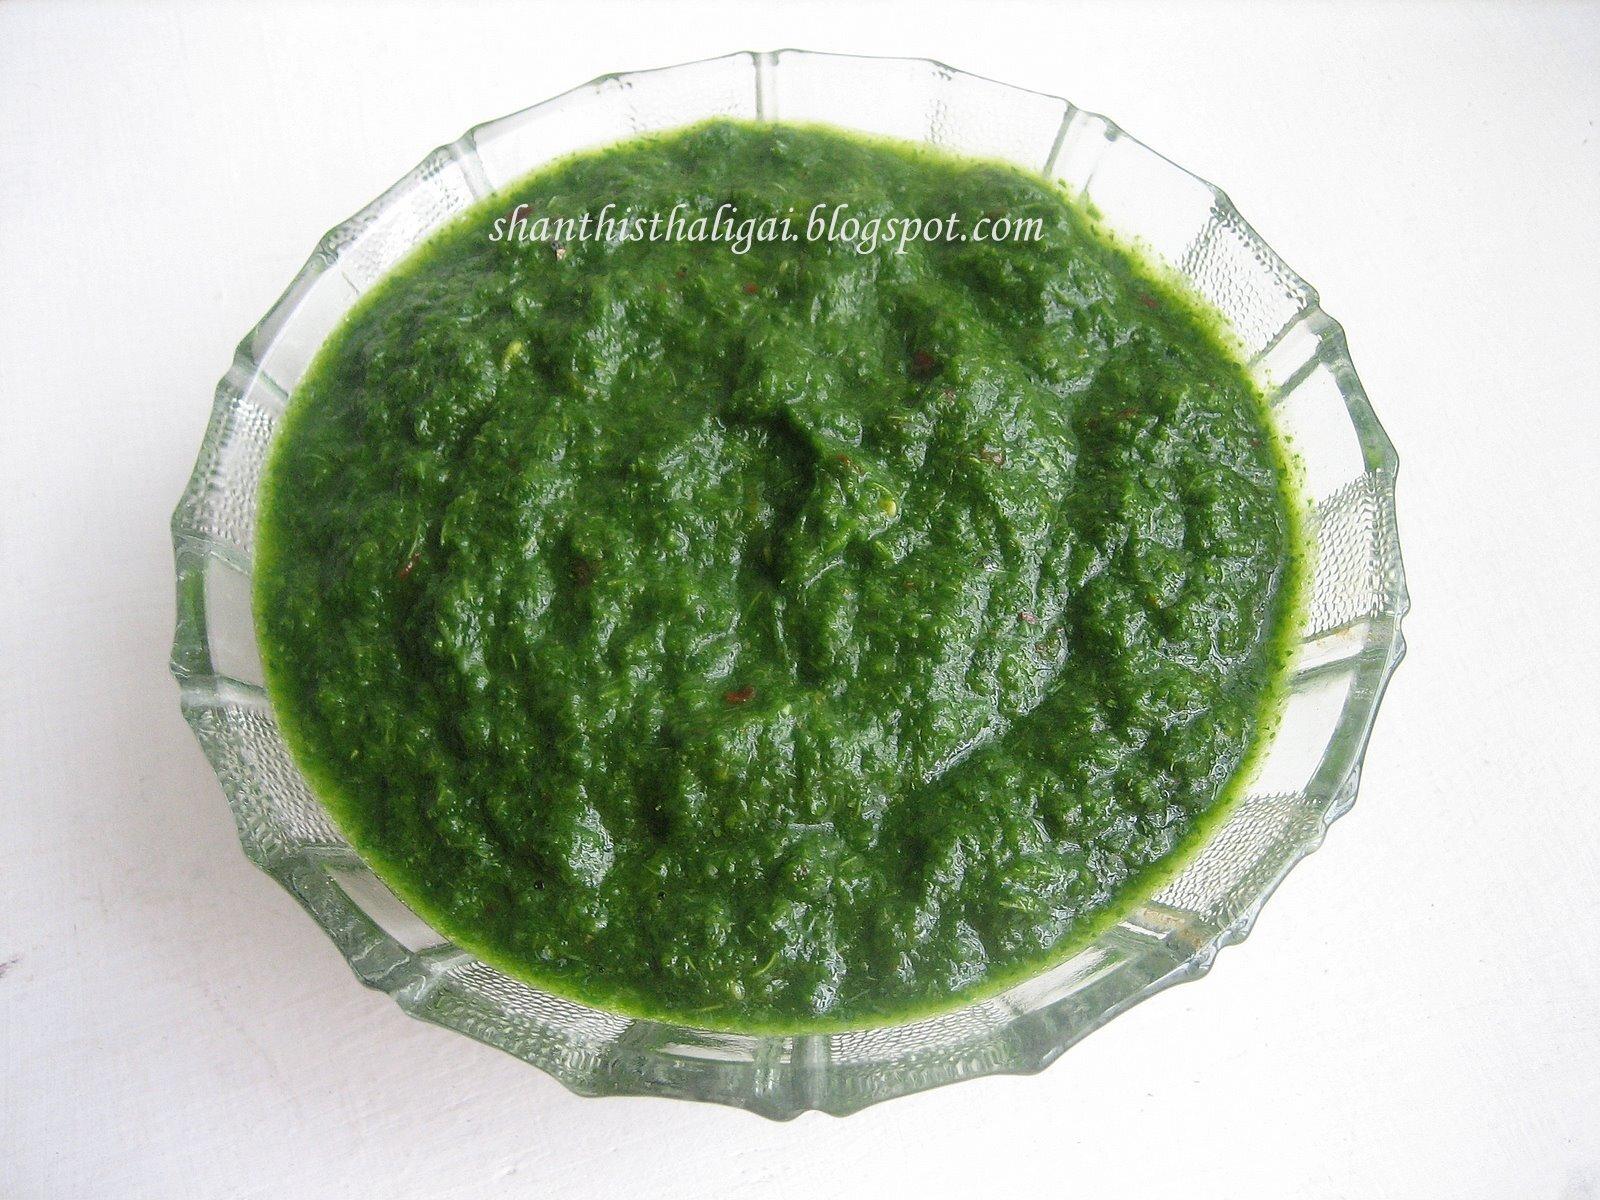 GREEN CHUTNEY / GREEN CHUTNEY FOR CHAAT